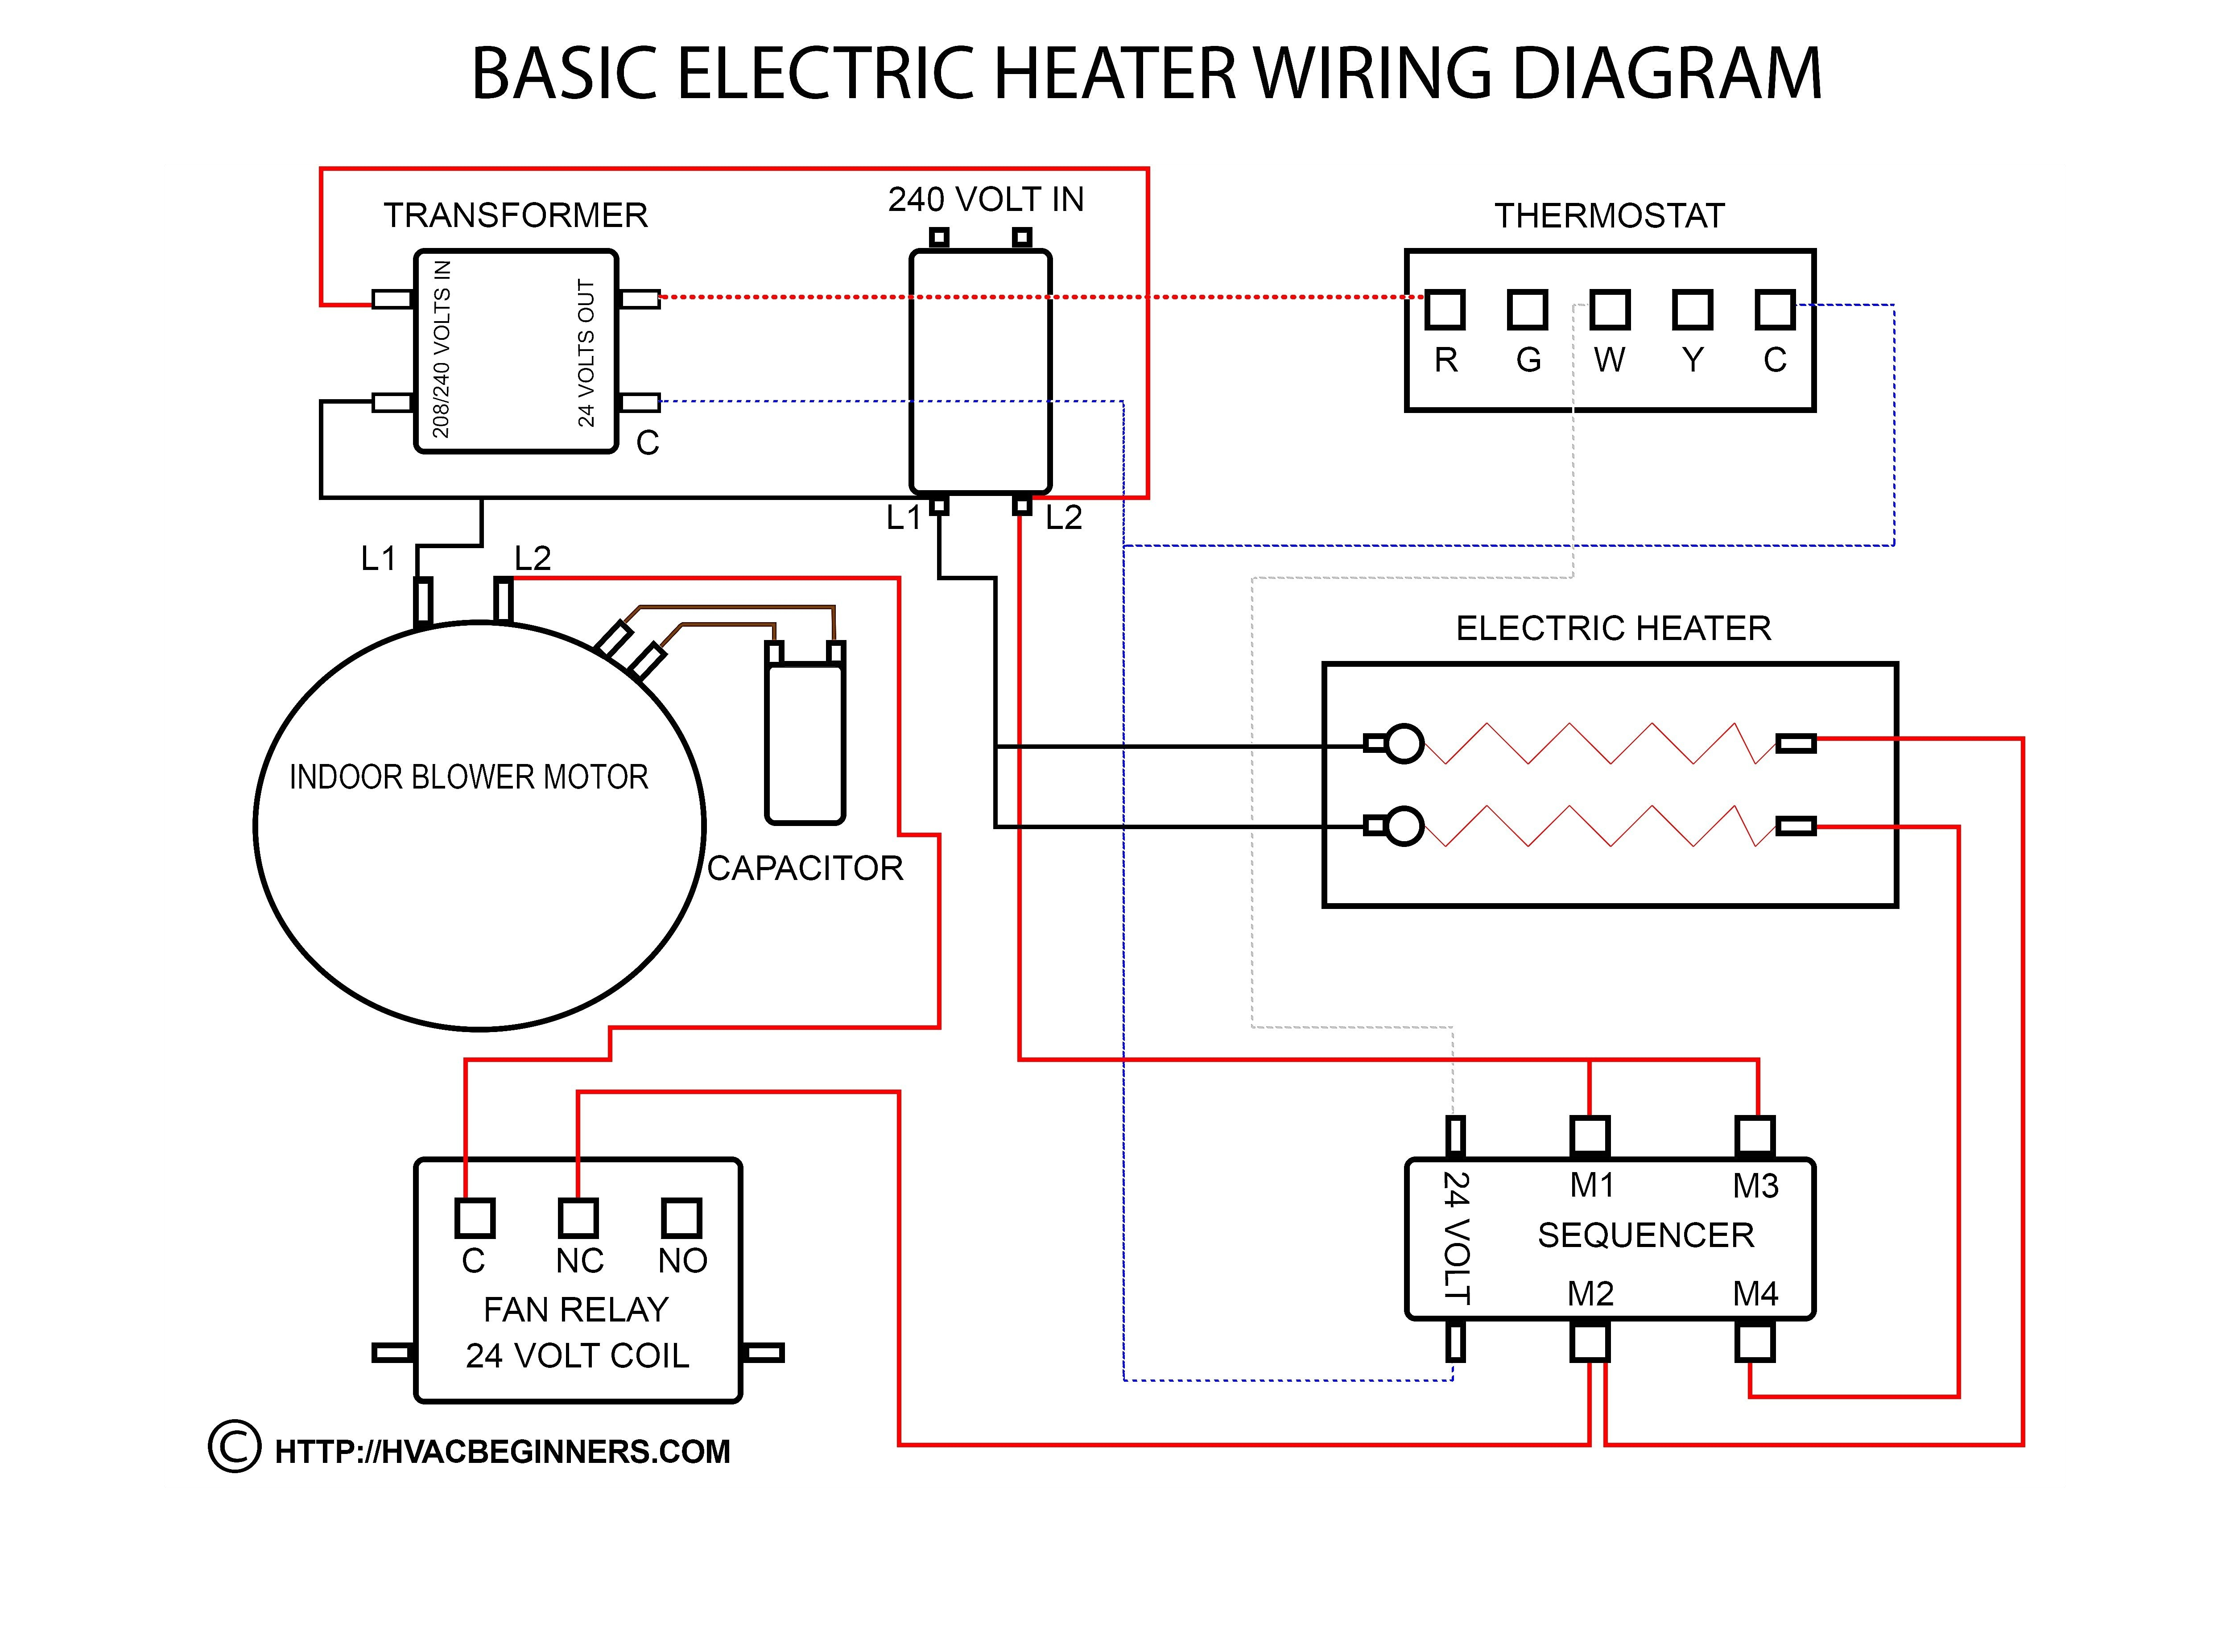 Wiring A Ac Thermostat Diagram New Hvac Wiring Diagram Best Wiring Diagram For Thermostat – Wire